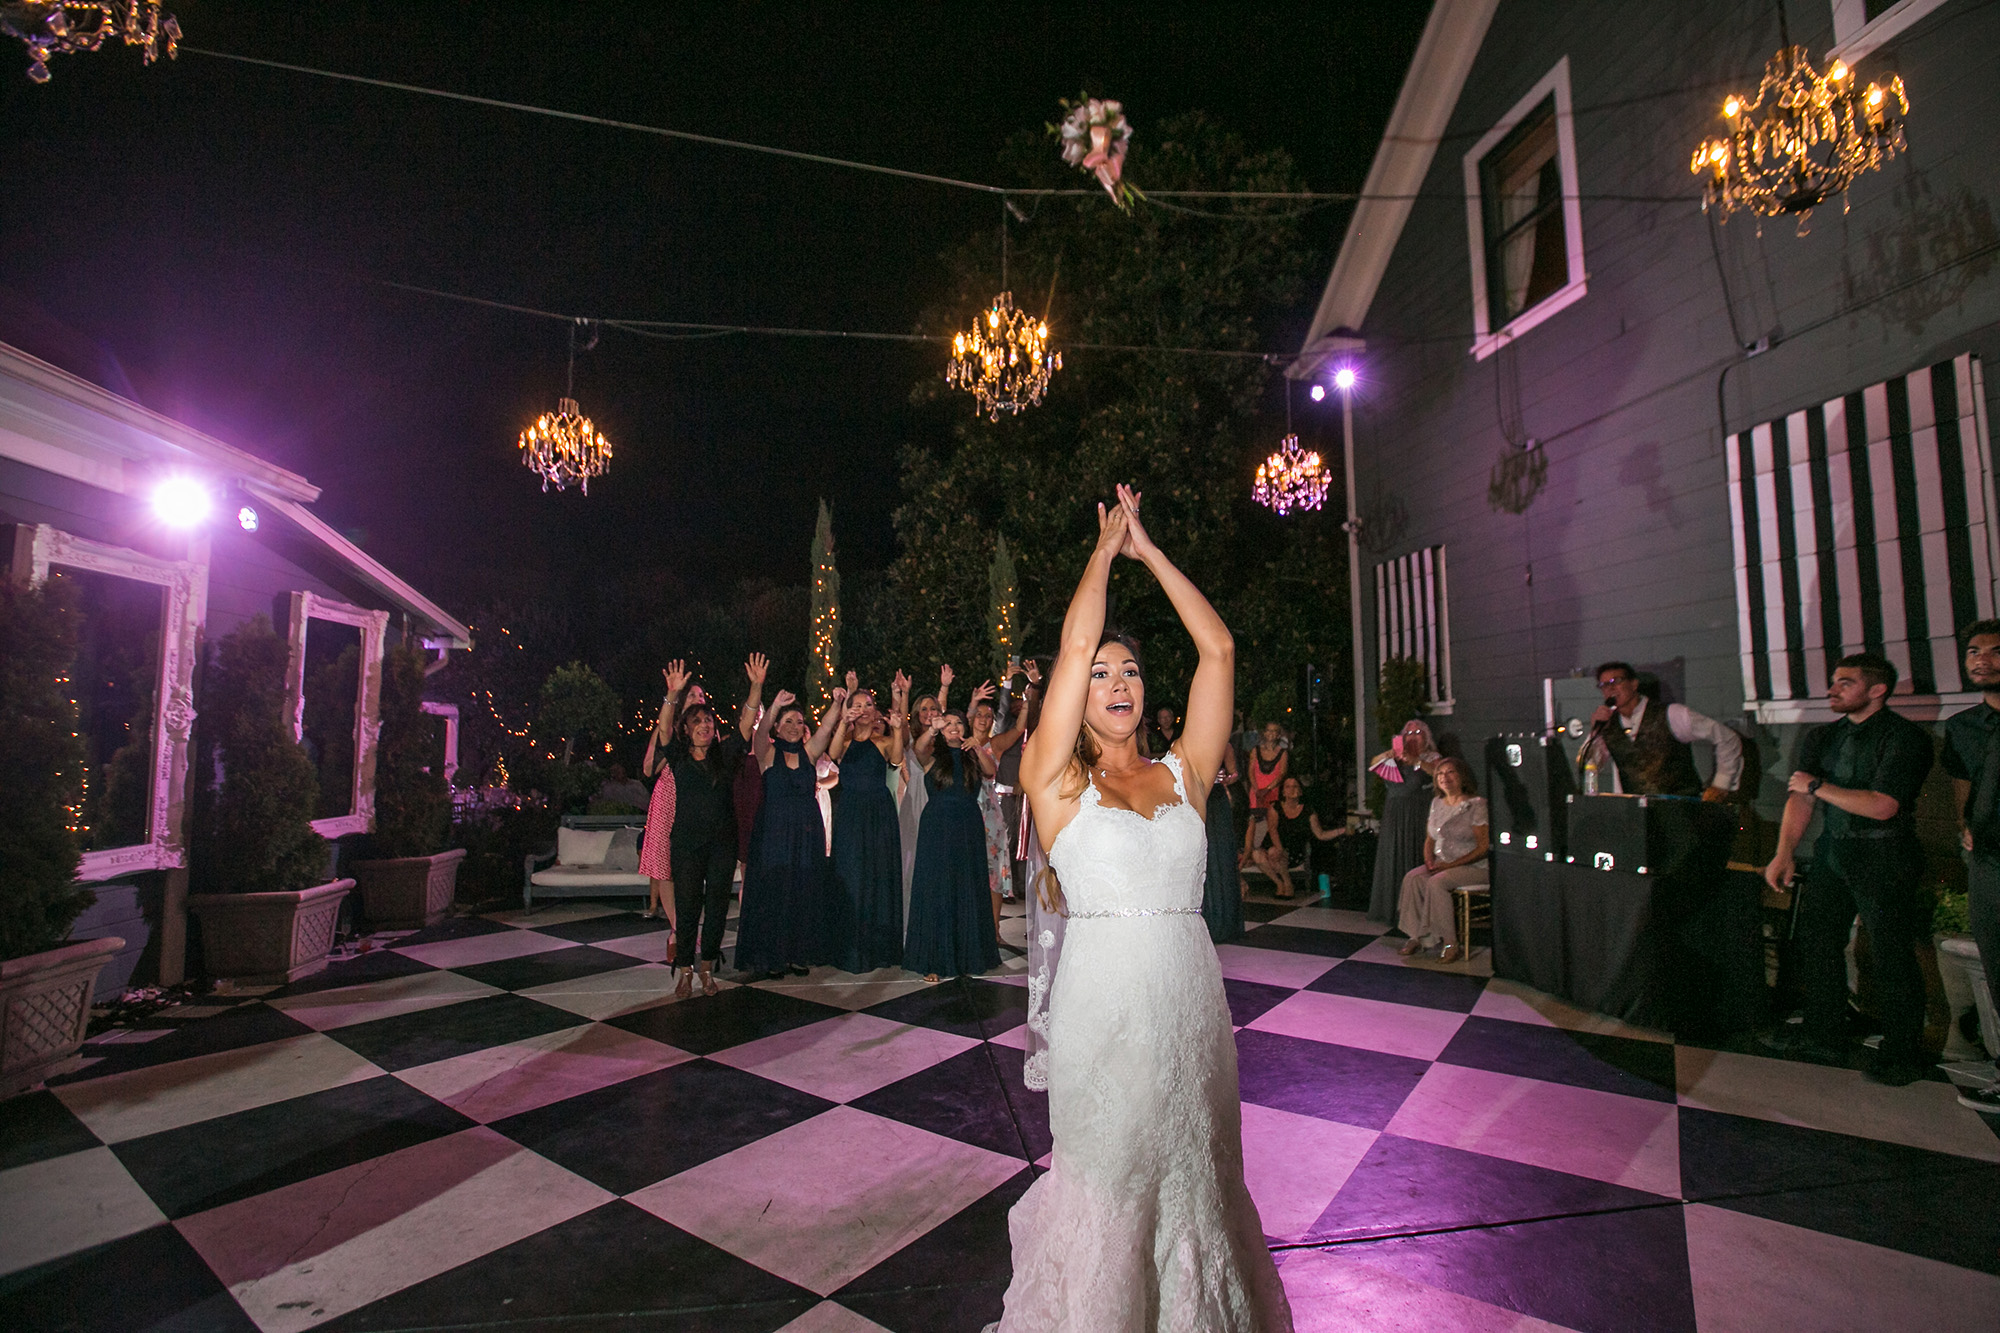 christmas-house-weddings-receptions-carrie-vines-119.jpg